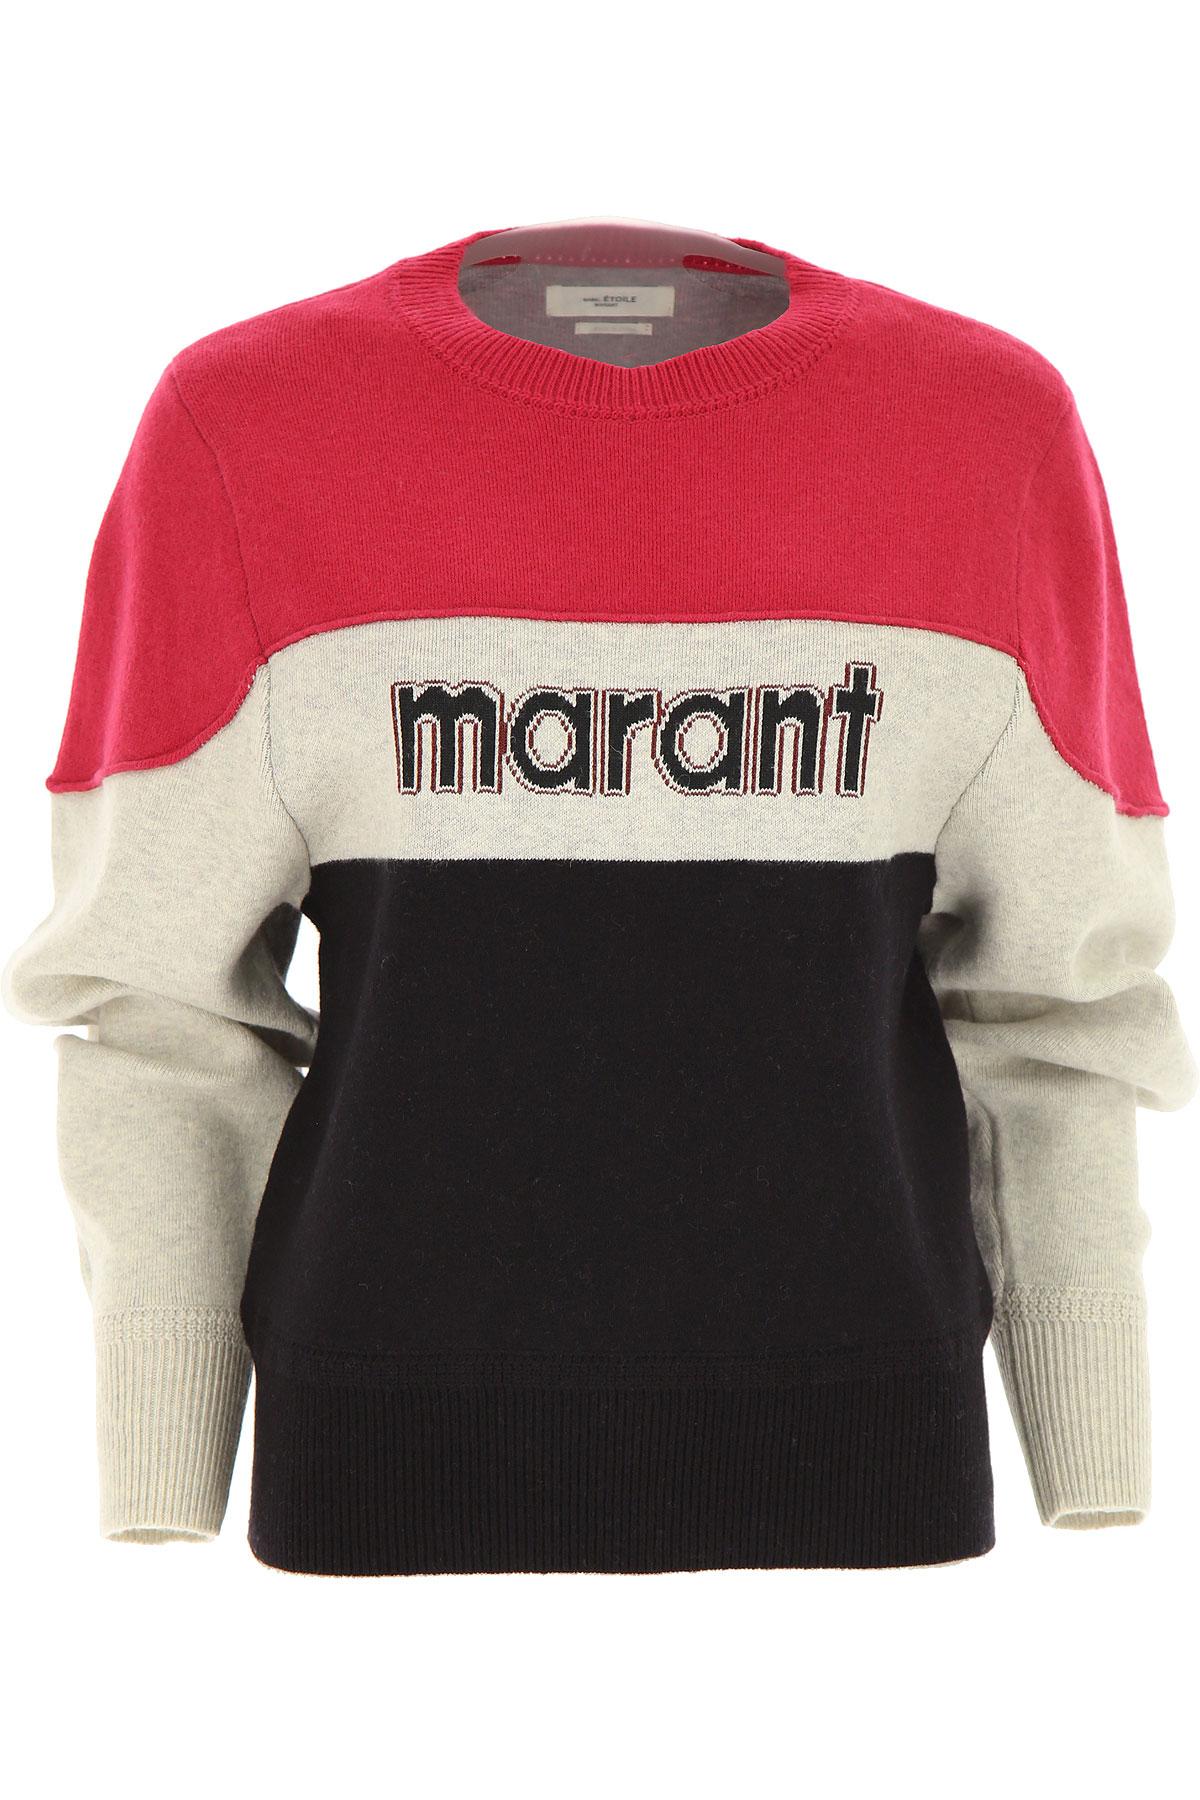 Isabel Marant Sweater for Women Jumper On Sale, Fuchsia, Cotton, 2019, 6 8